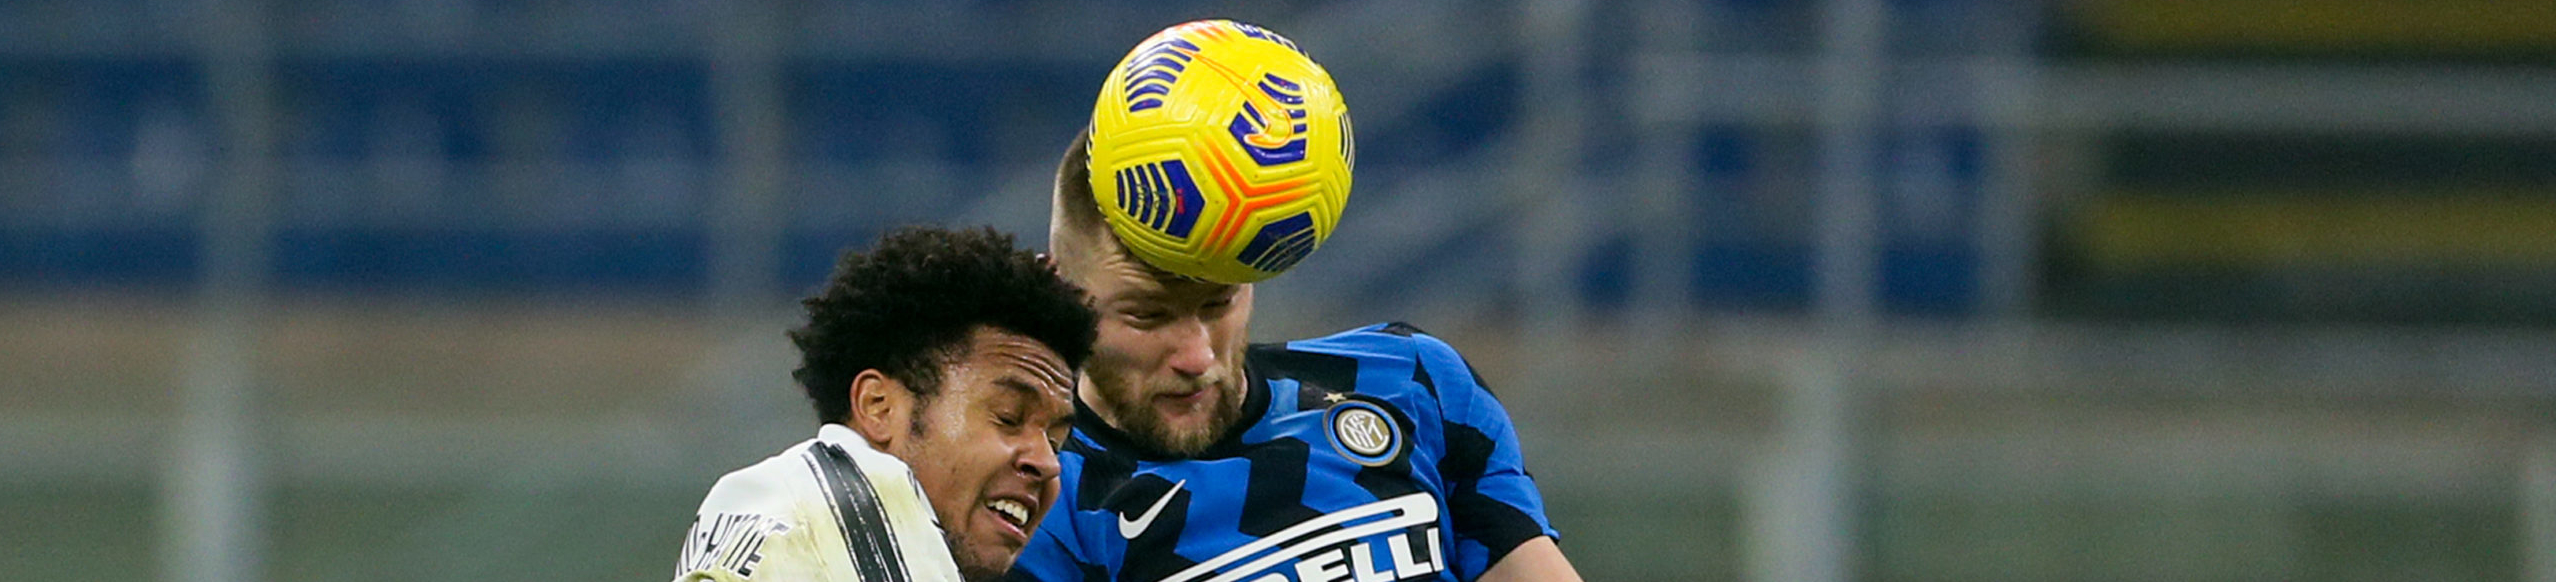 Pronostico Juventus-Inter: un recupero a sorpresa tra i bianconeri? – le ultimissime